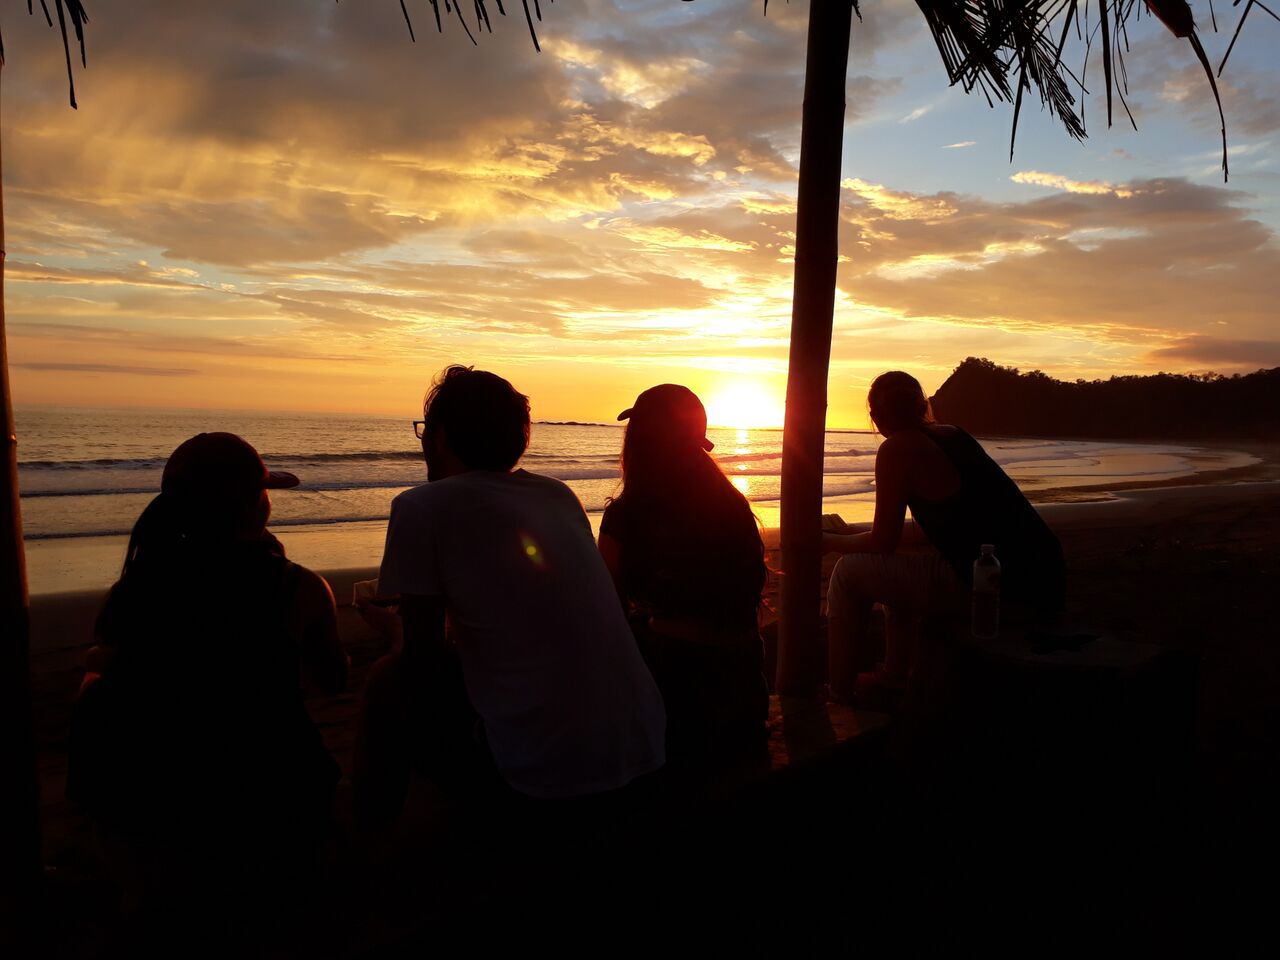 sunset crew